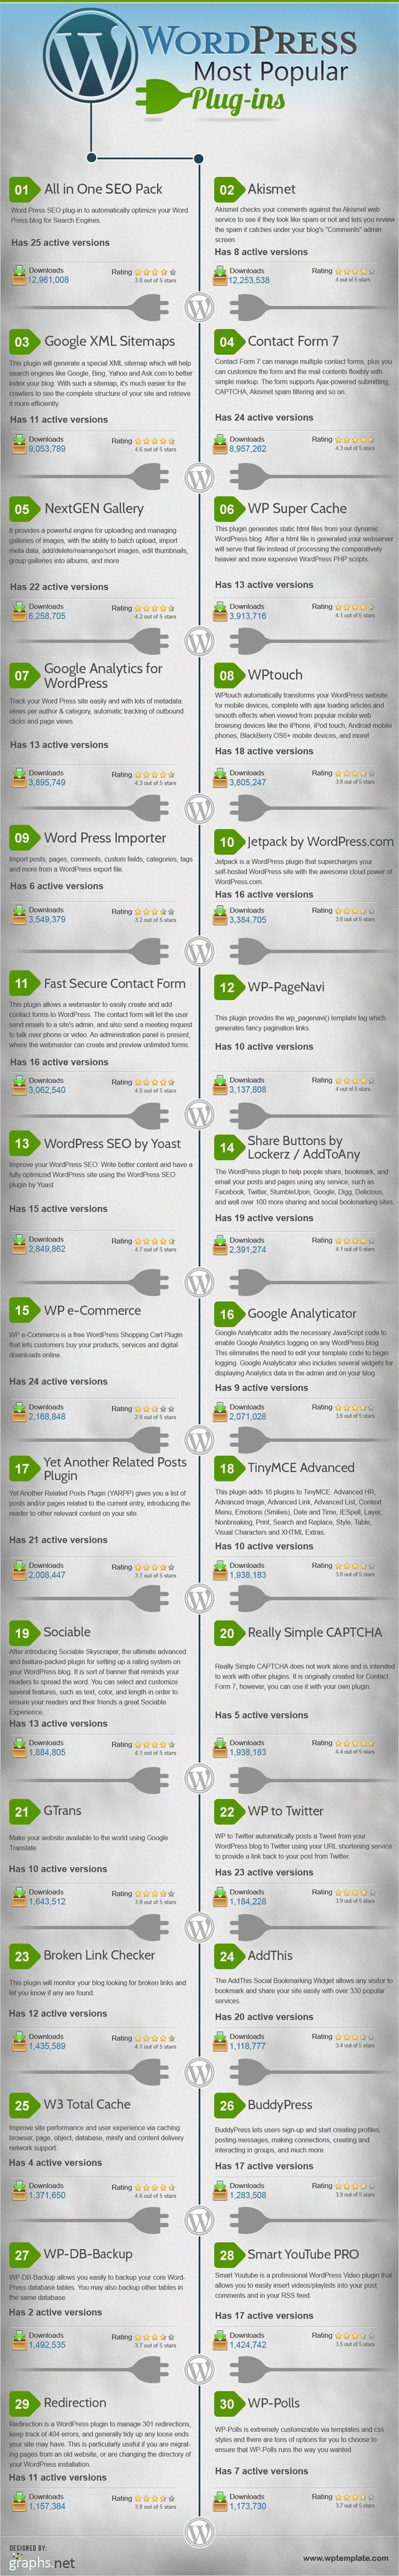 En popüler 30 WordPress eklentisi [İnfografik]